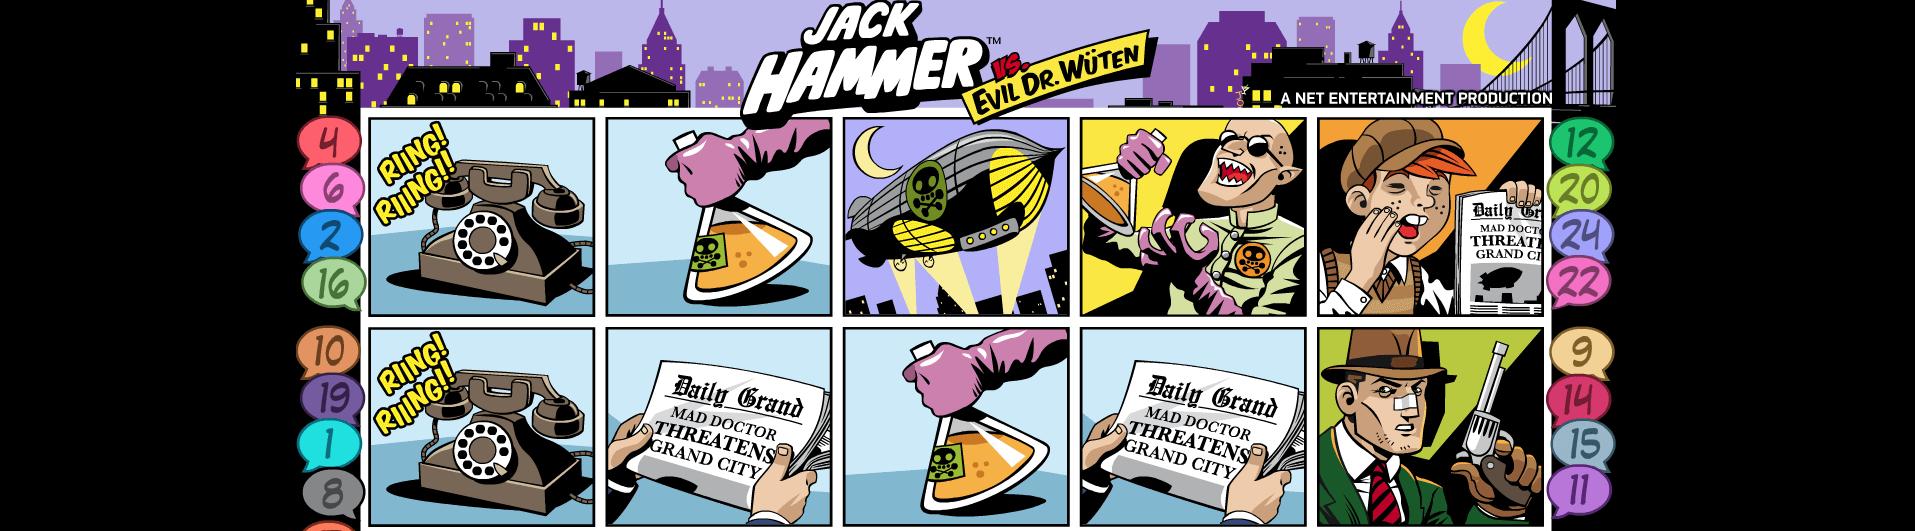 jack hammer netent jocuri slot multa bafta